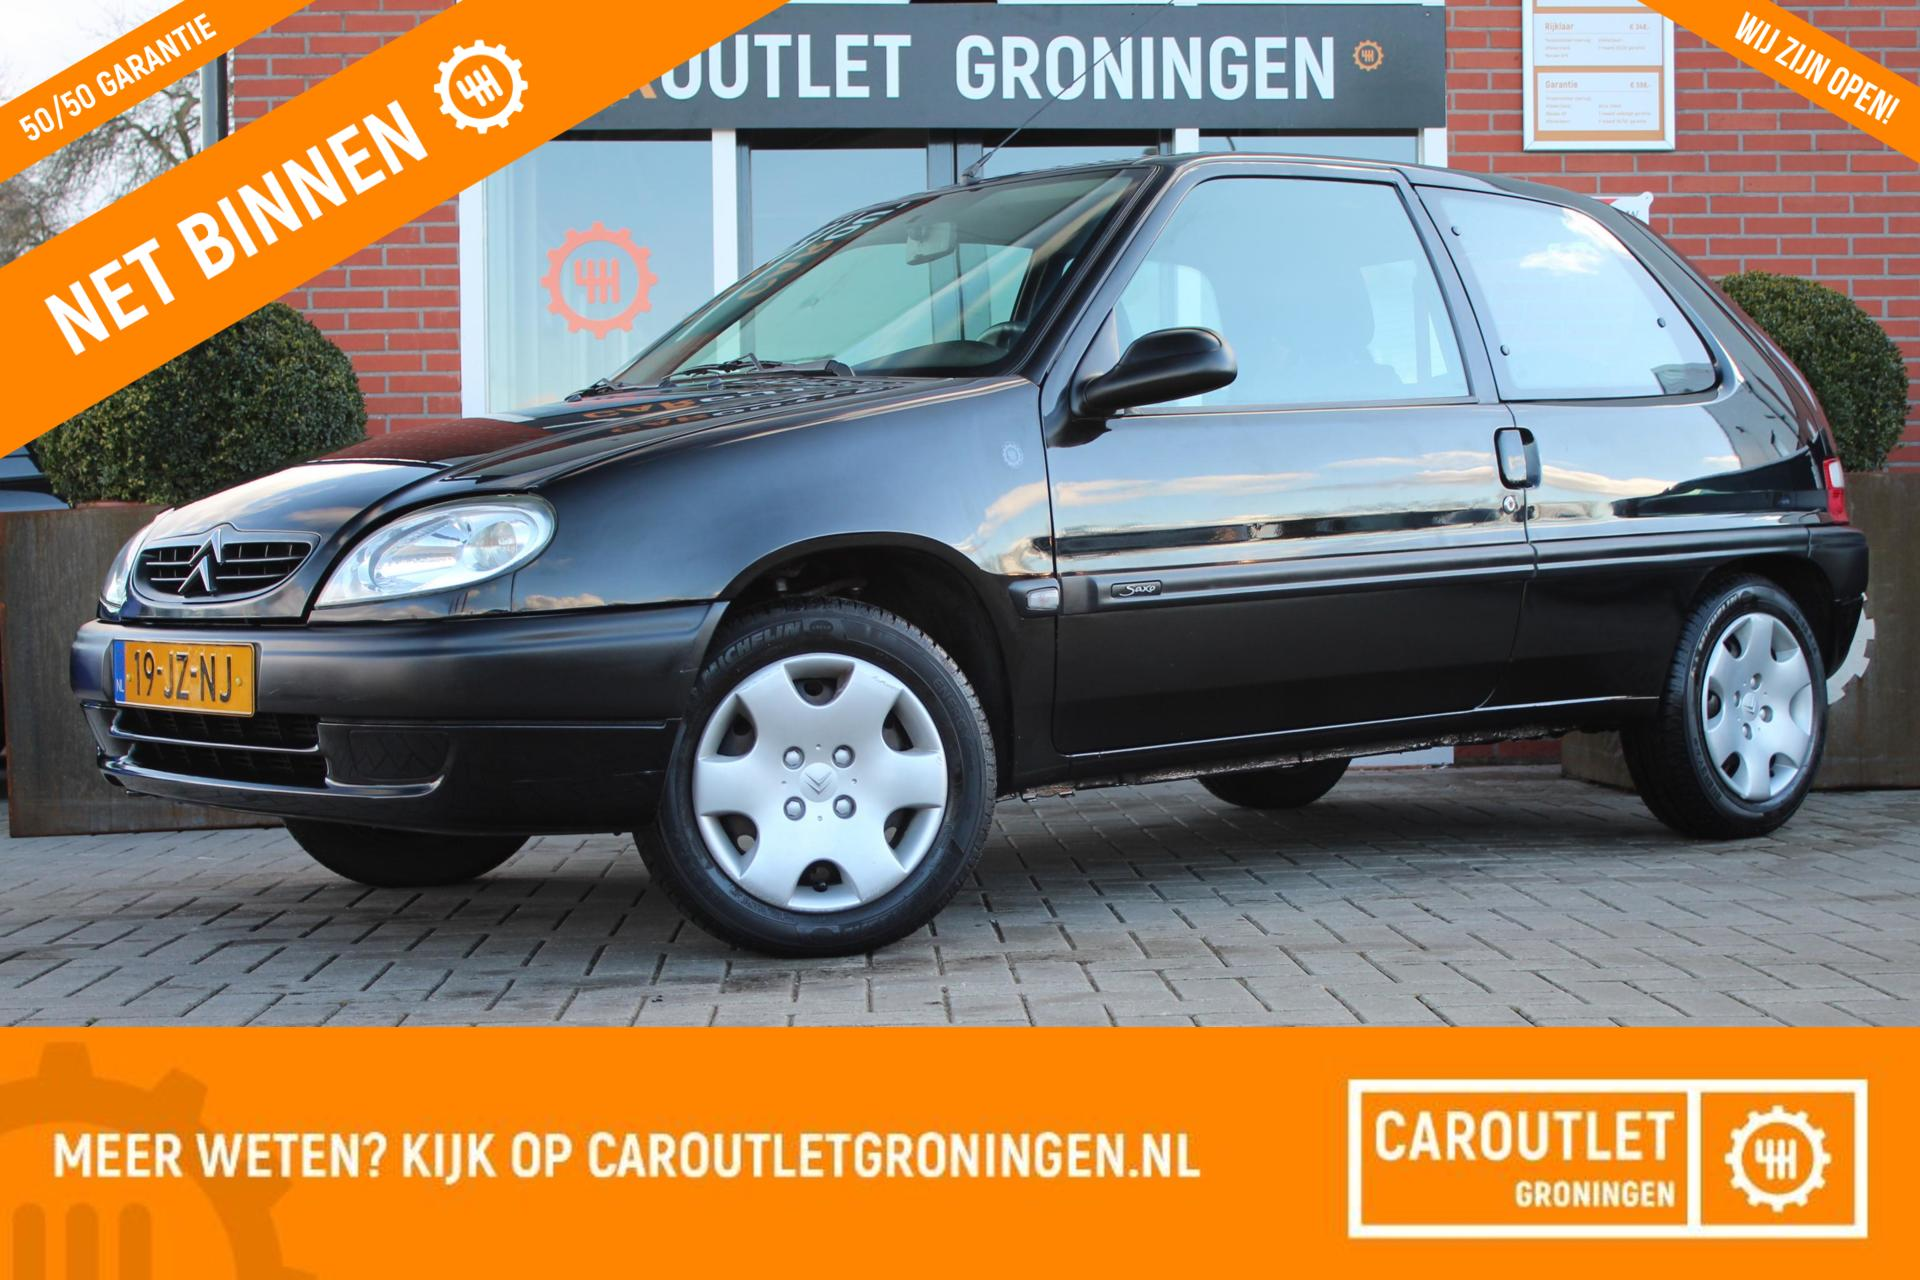 Caroutlet Groningen - Citroen Saxo 1.1i Furio | 65586KM | NW APK | 19 PER MAAND